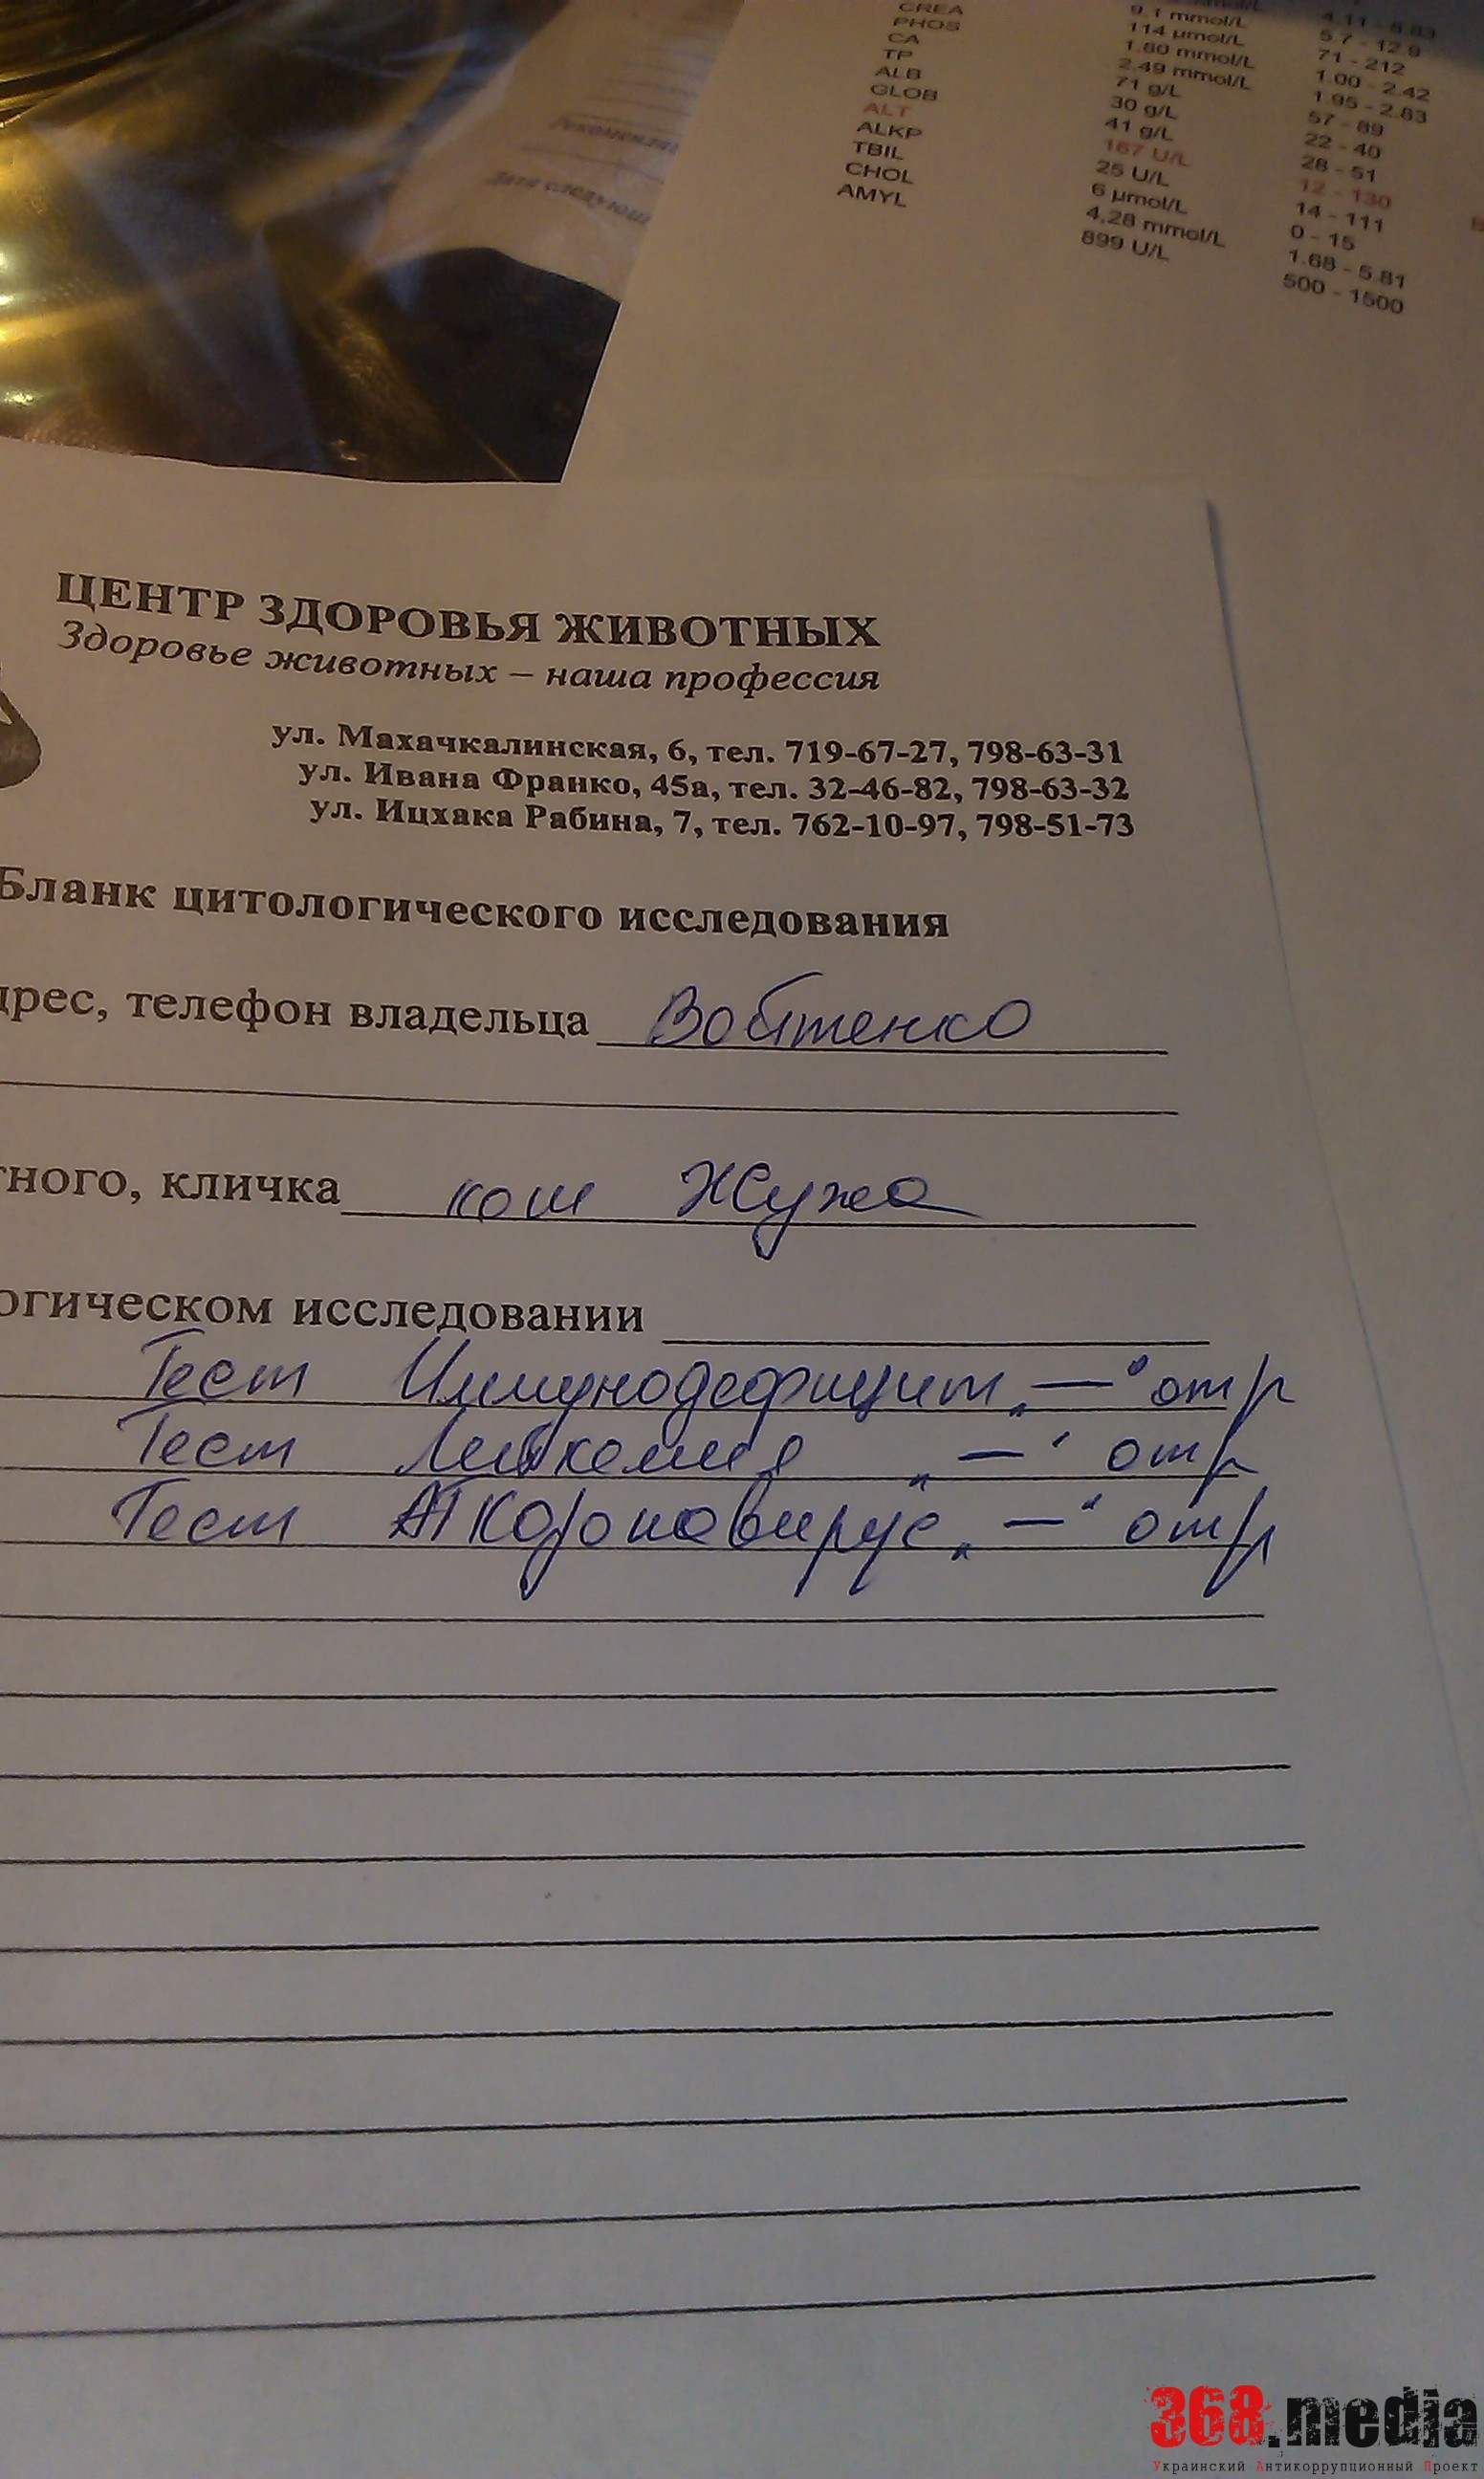 Документы клиники на Жужу. Фото: Алена Войтенко